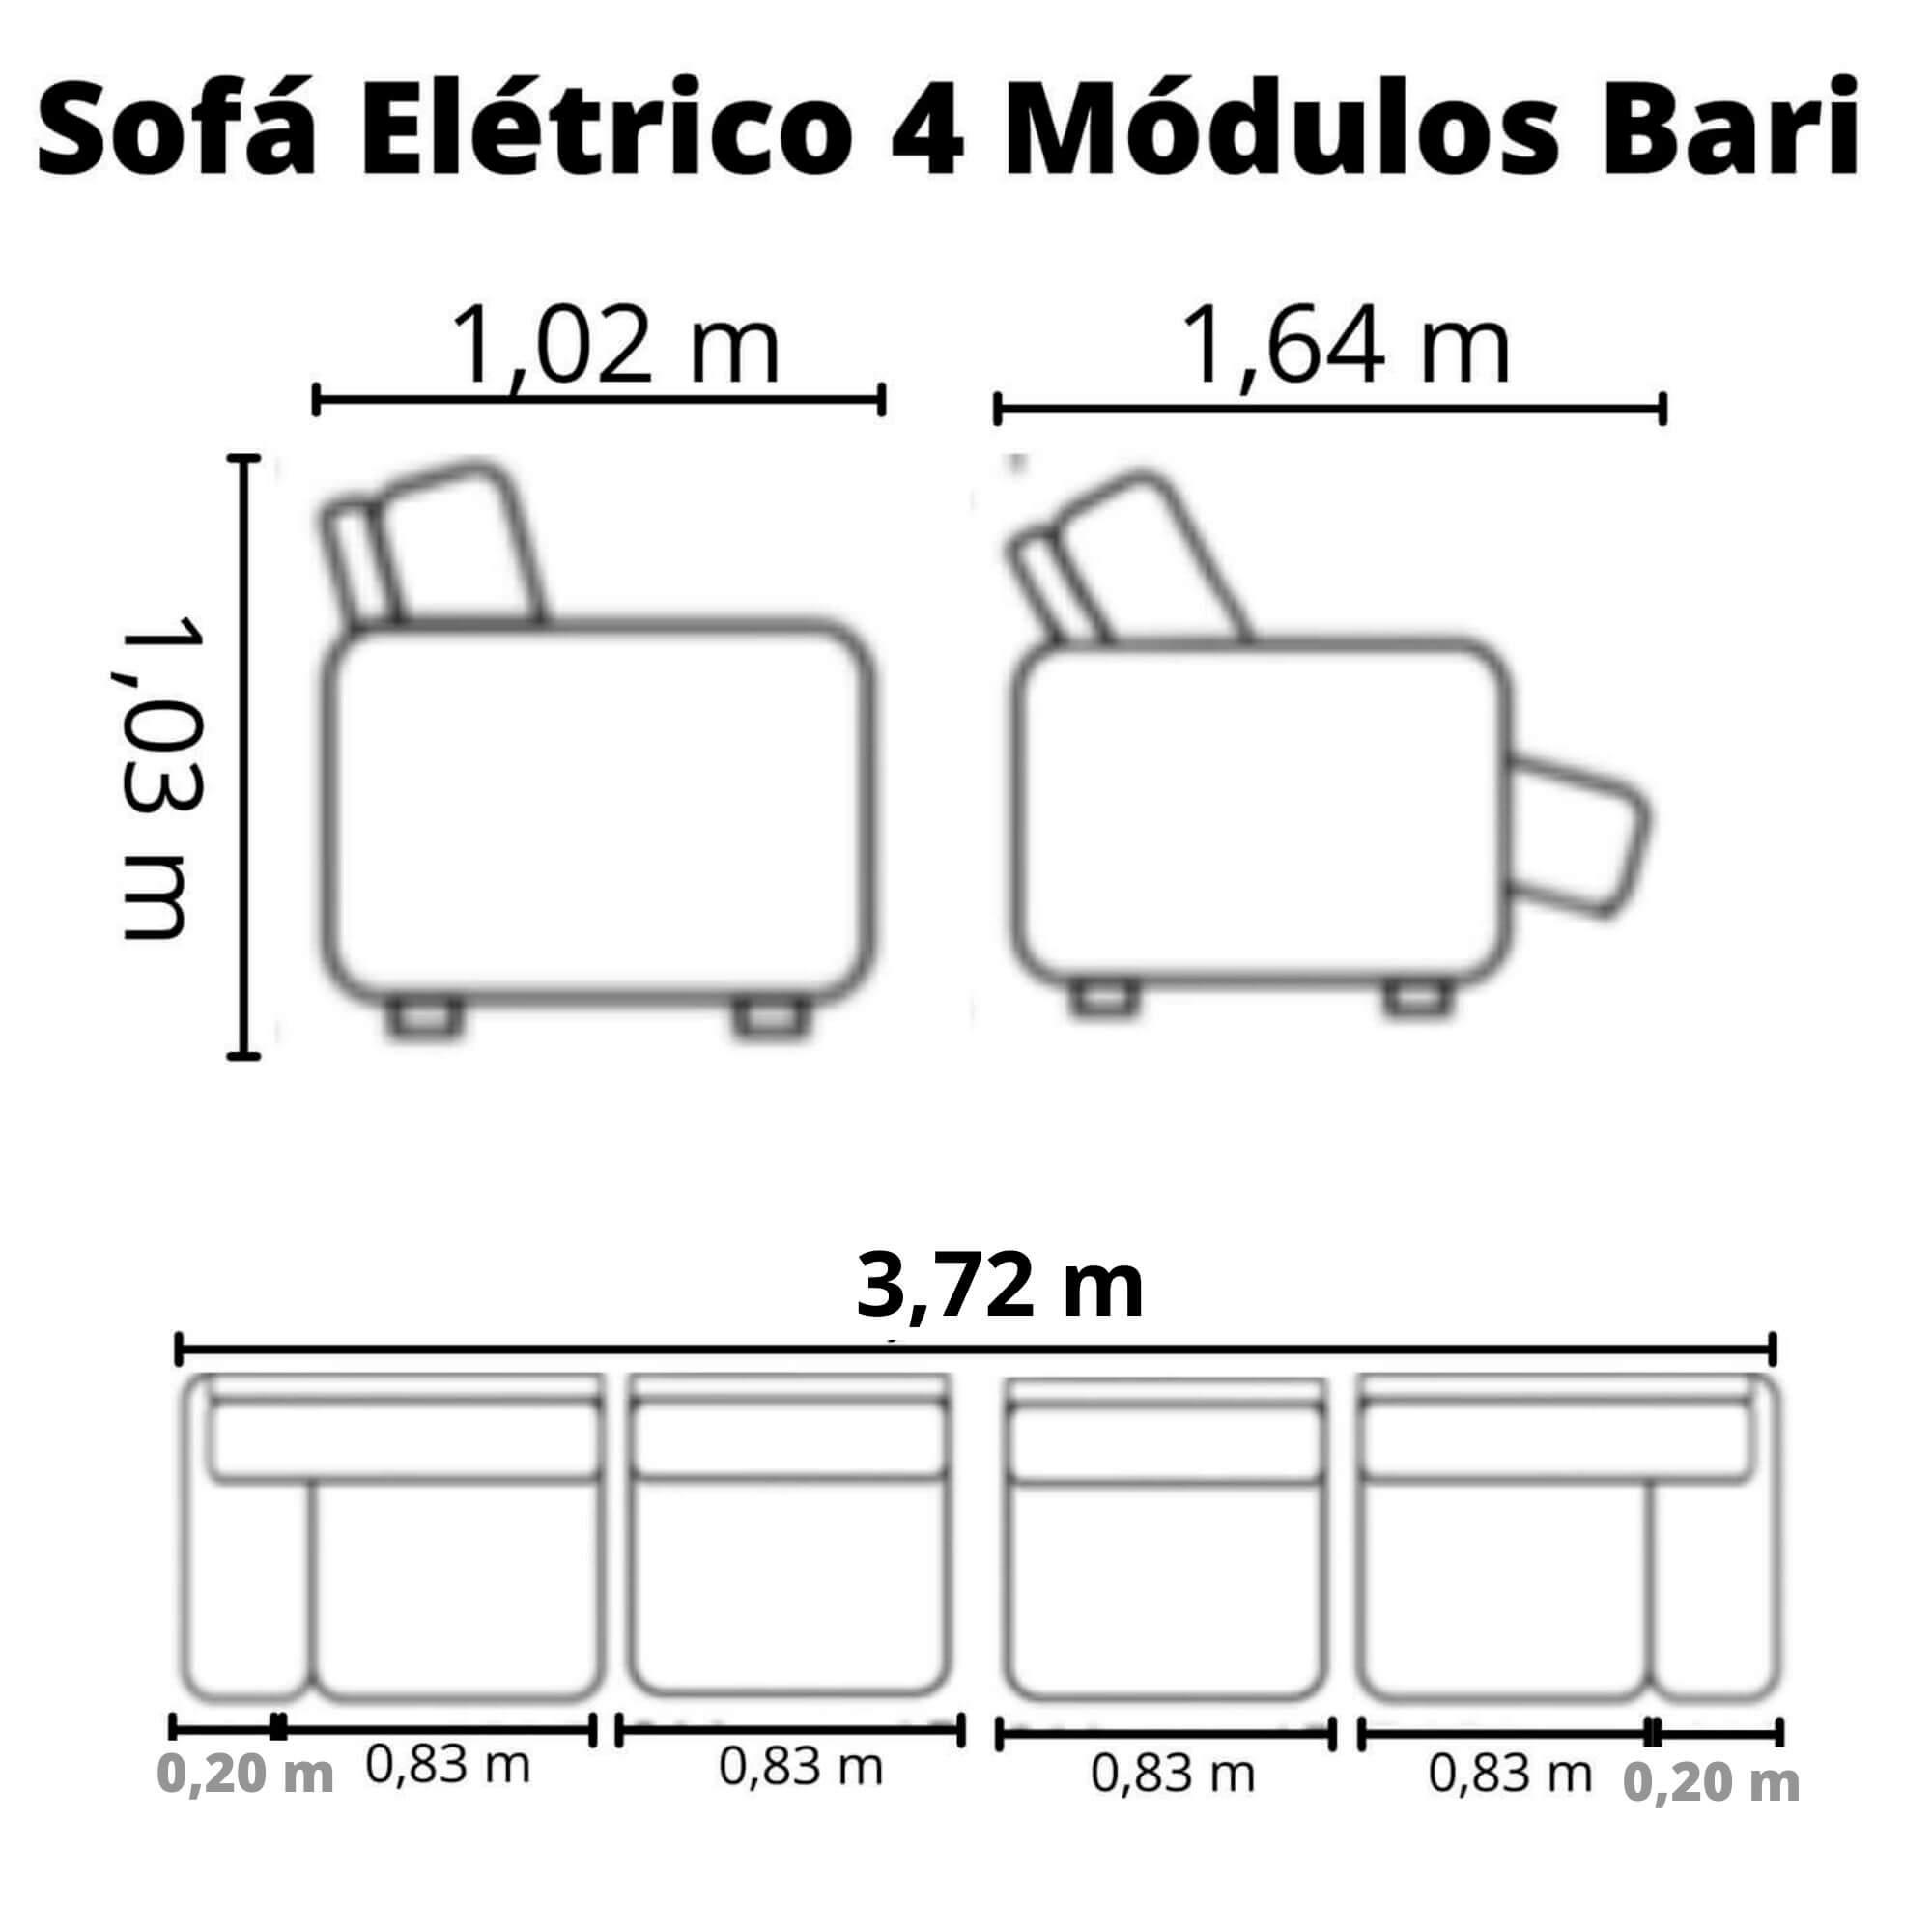 Sofá Retrátil Elétrico de Couro 372cm - Bari Havanna